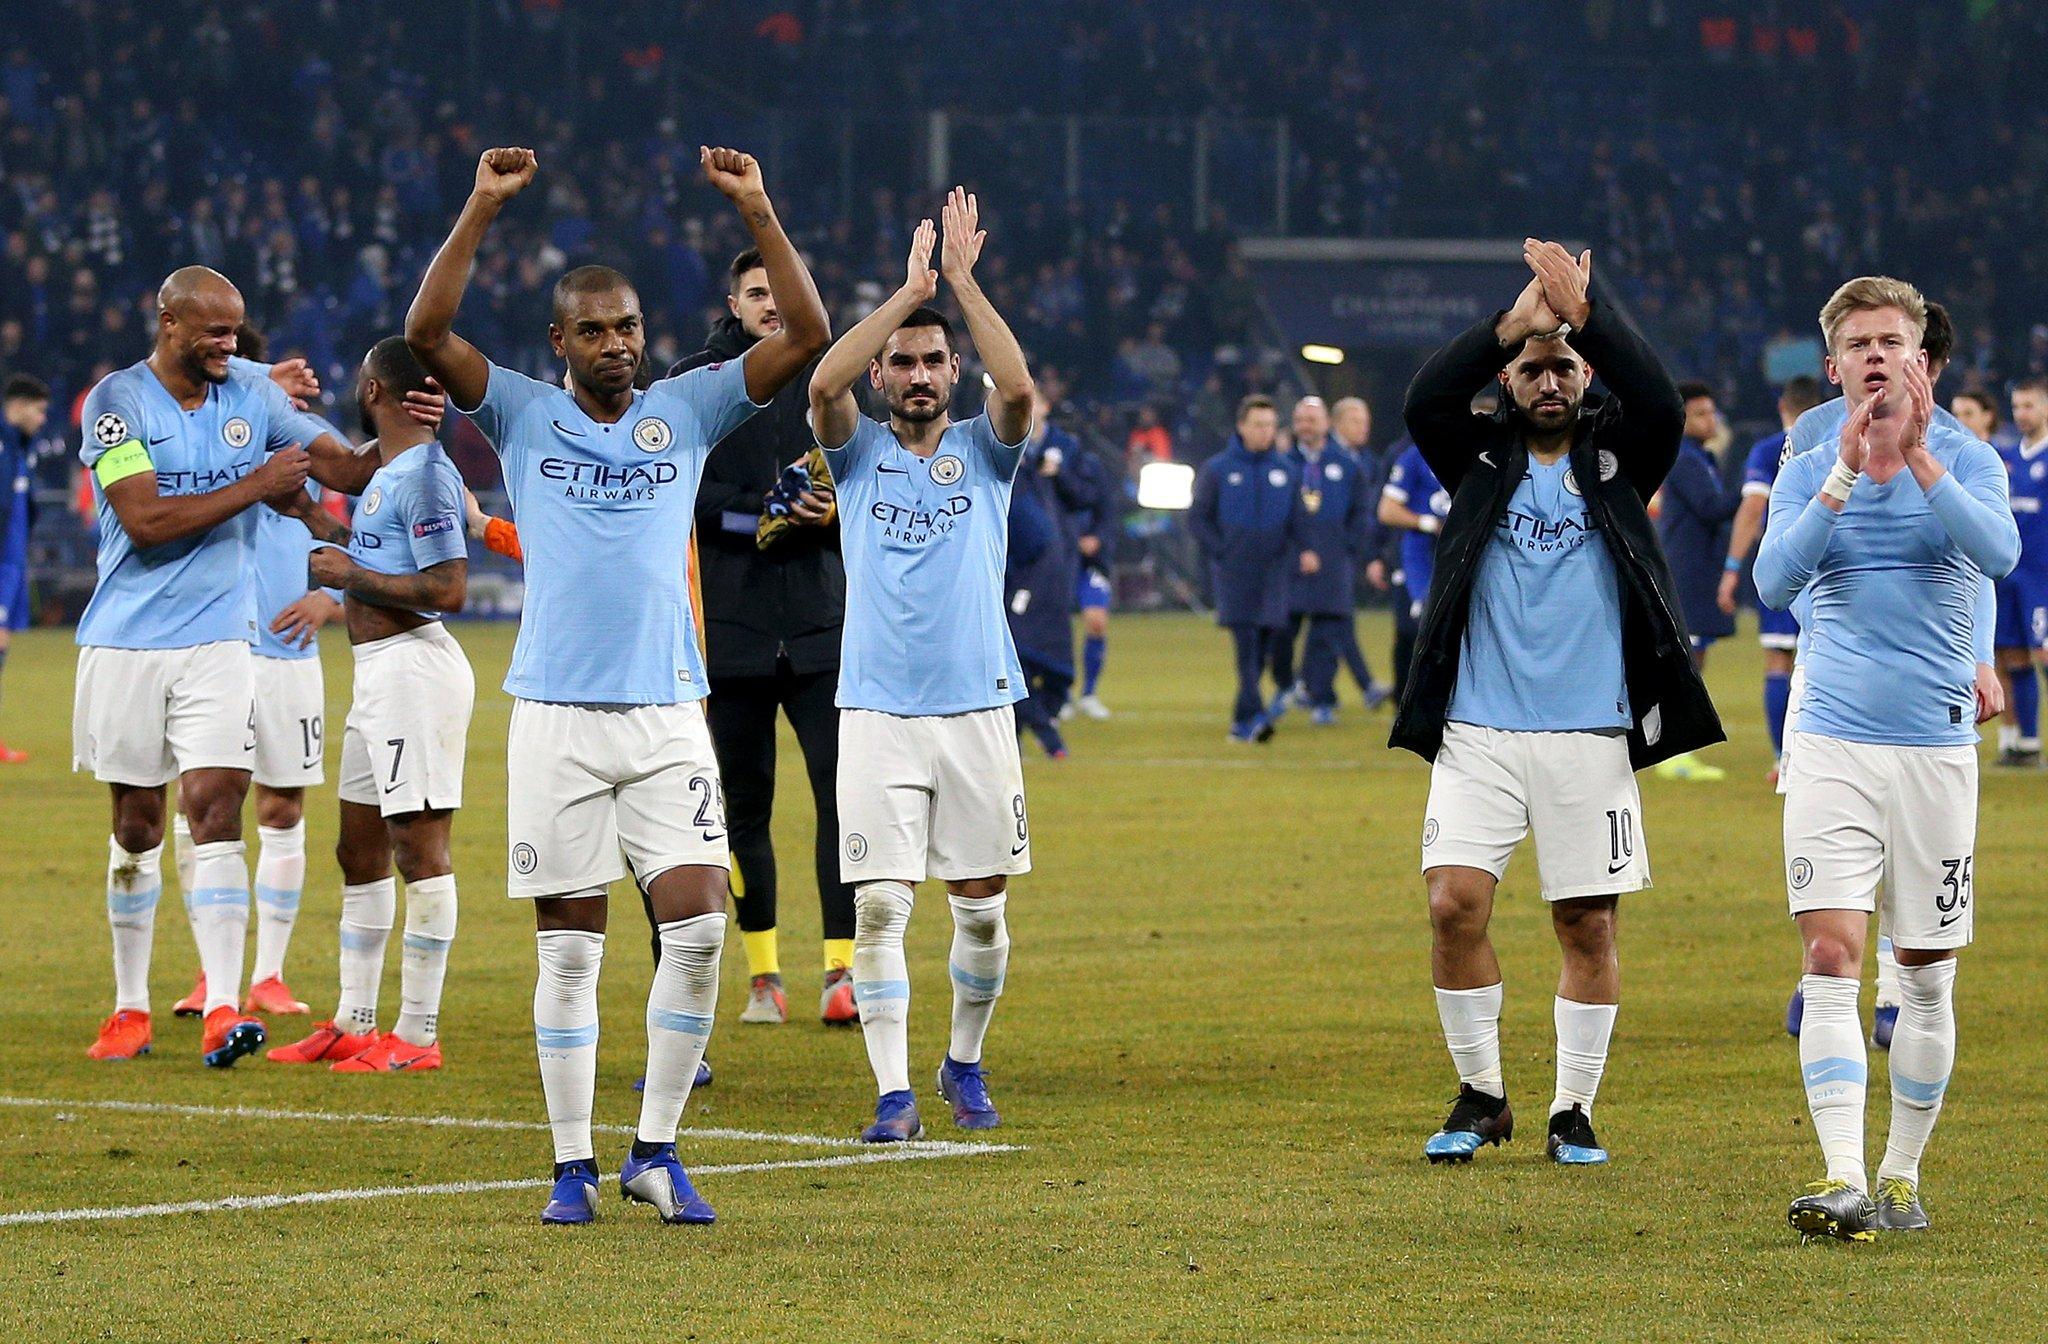 UCL: Manchester City vs Schalke 04 Preview